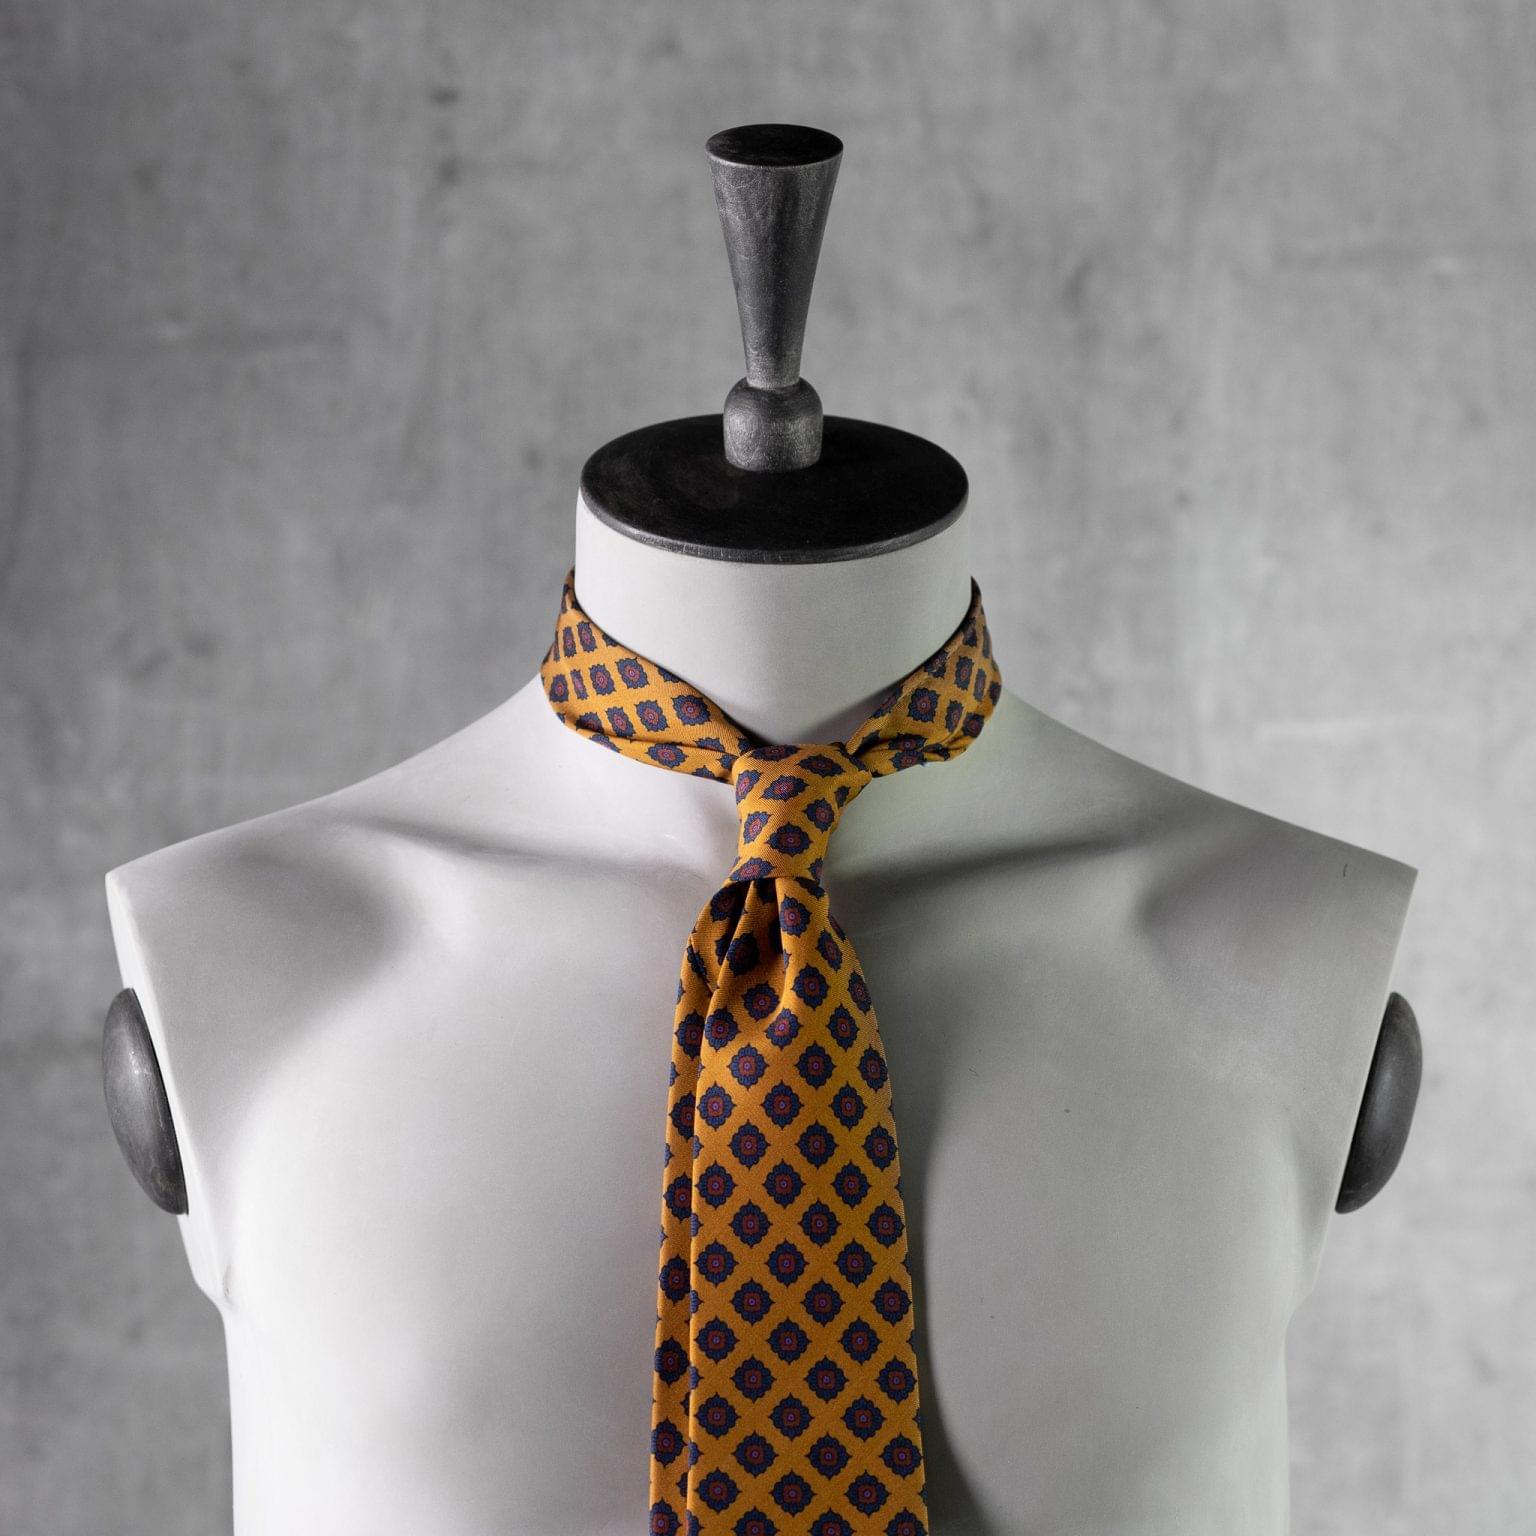 PRINTED-SILK-SEDA-ESTAMPADA-0436-Tie-Initials-Corbata-Iniciales-The-Seelk-3